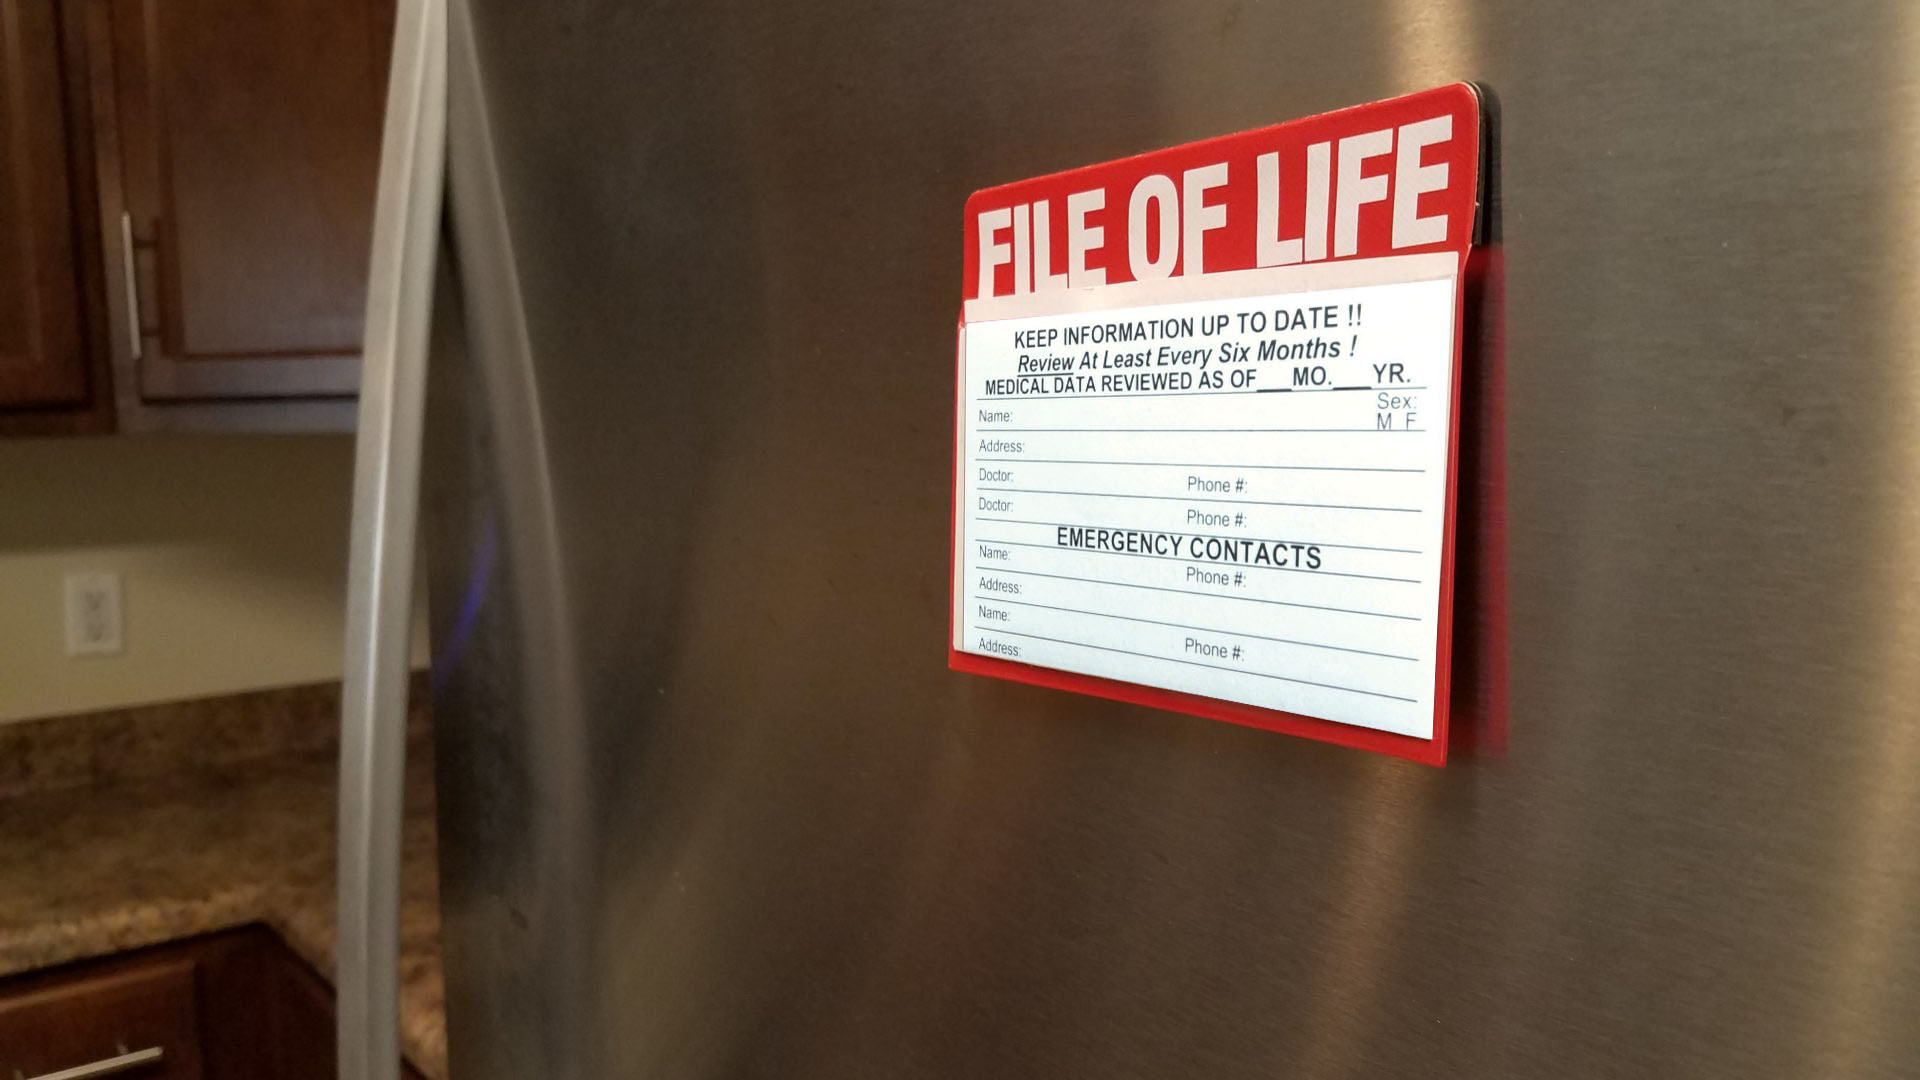 File of Life on the fridge.jpg